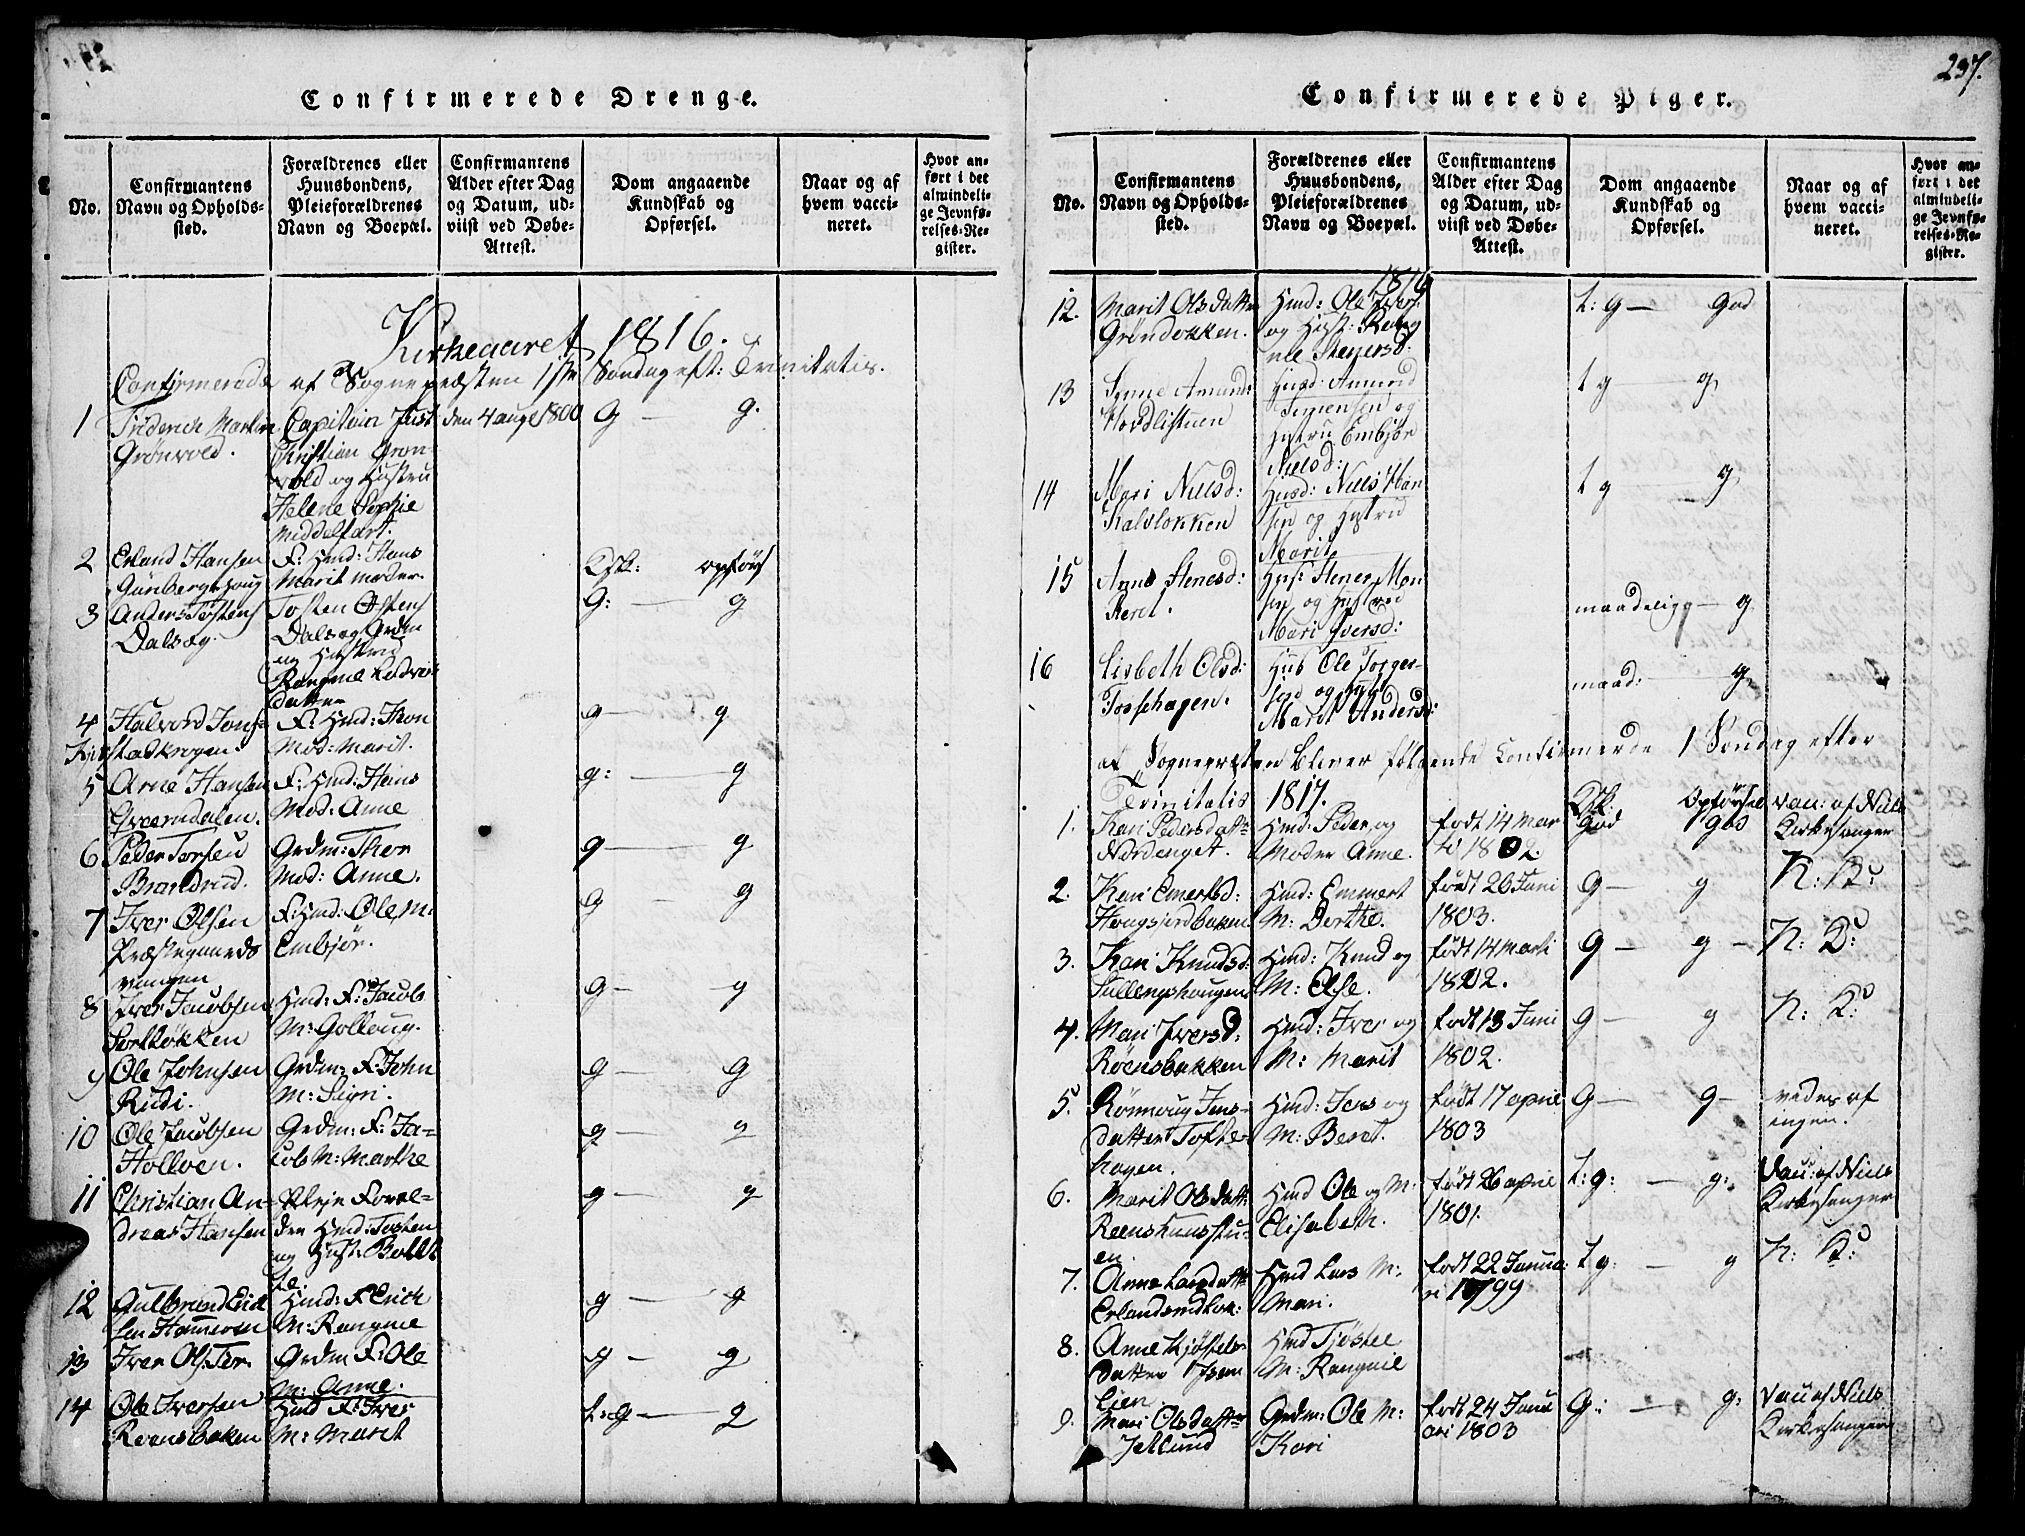 SAH, Fron prestekontor, H/Ha/Hab/L0001: Klokkerbok nr. 1, 1816-1843, s. 237